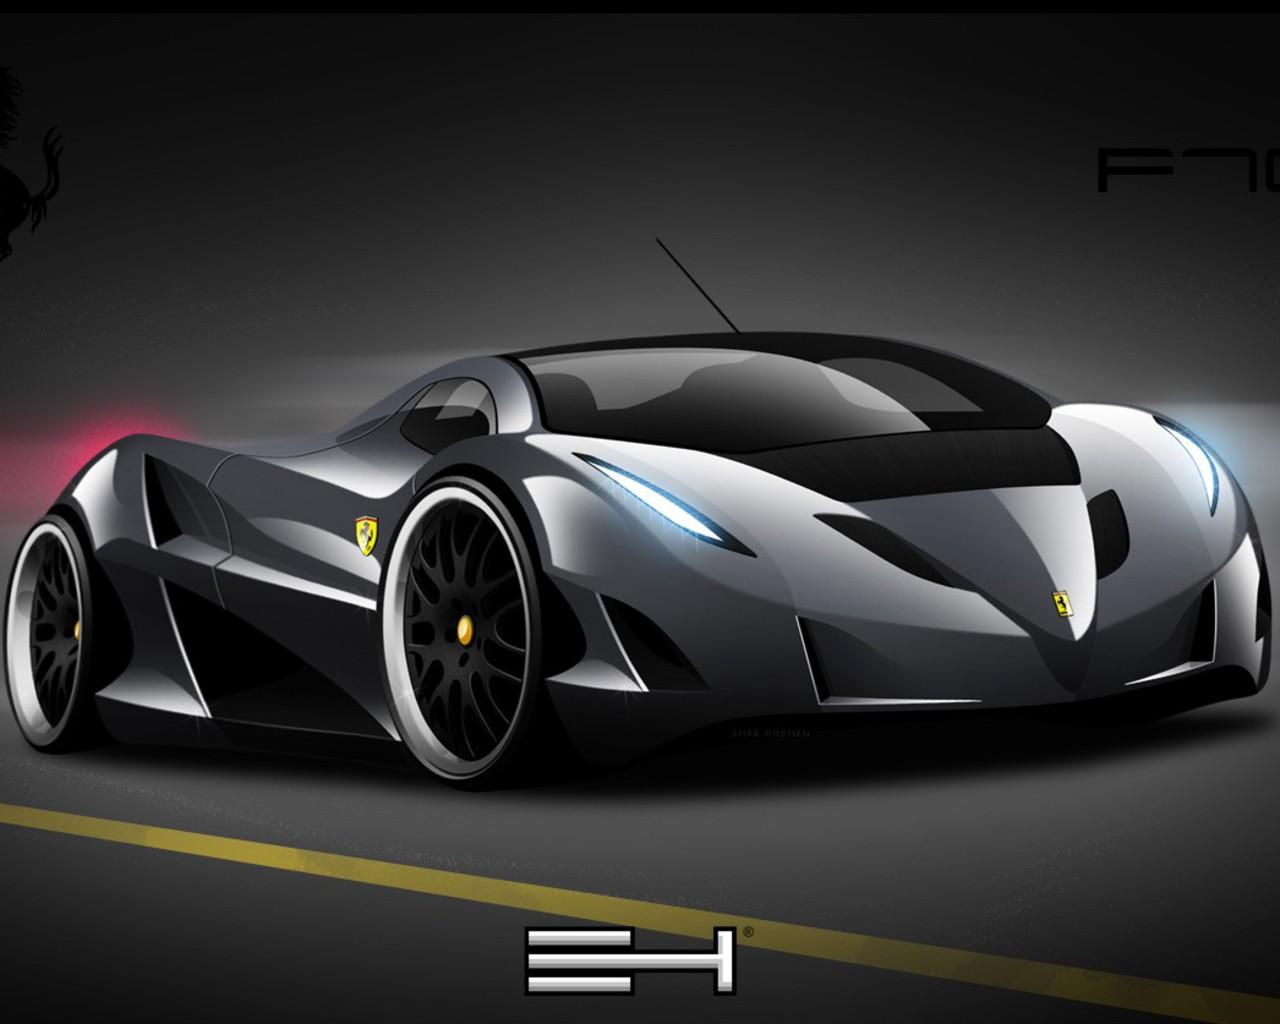 Super Cars Free Ferrari Desktop At Cardesktop 123177 Wallpaper wallpaper